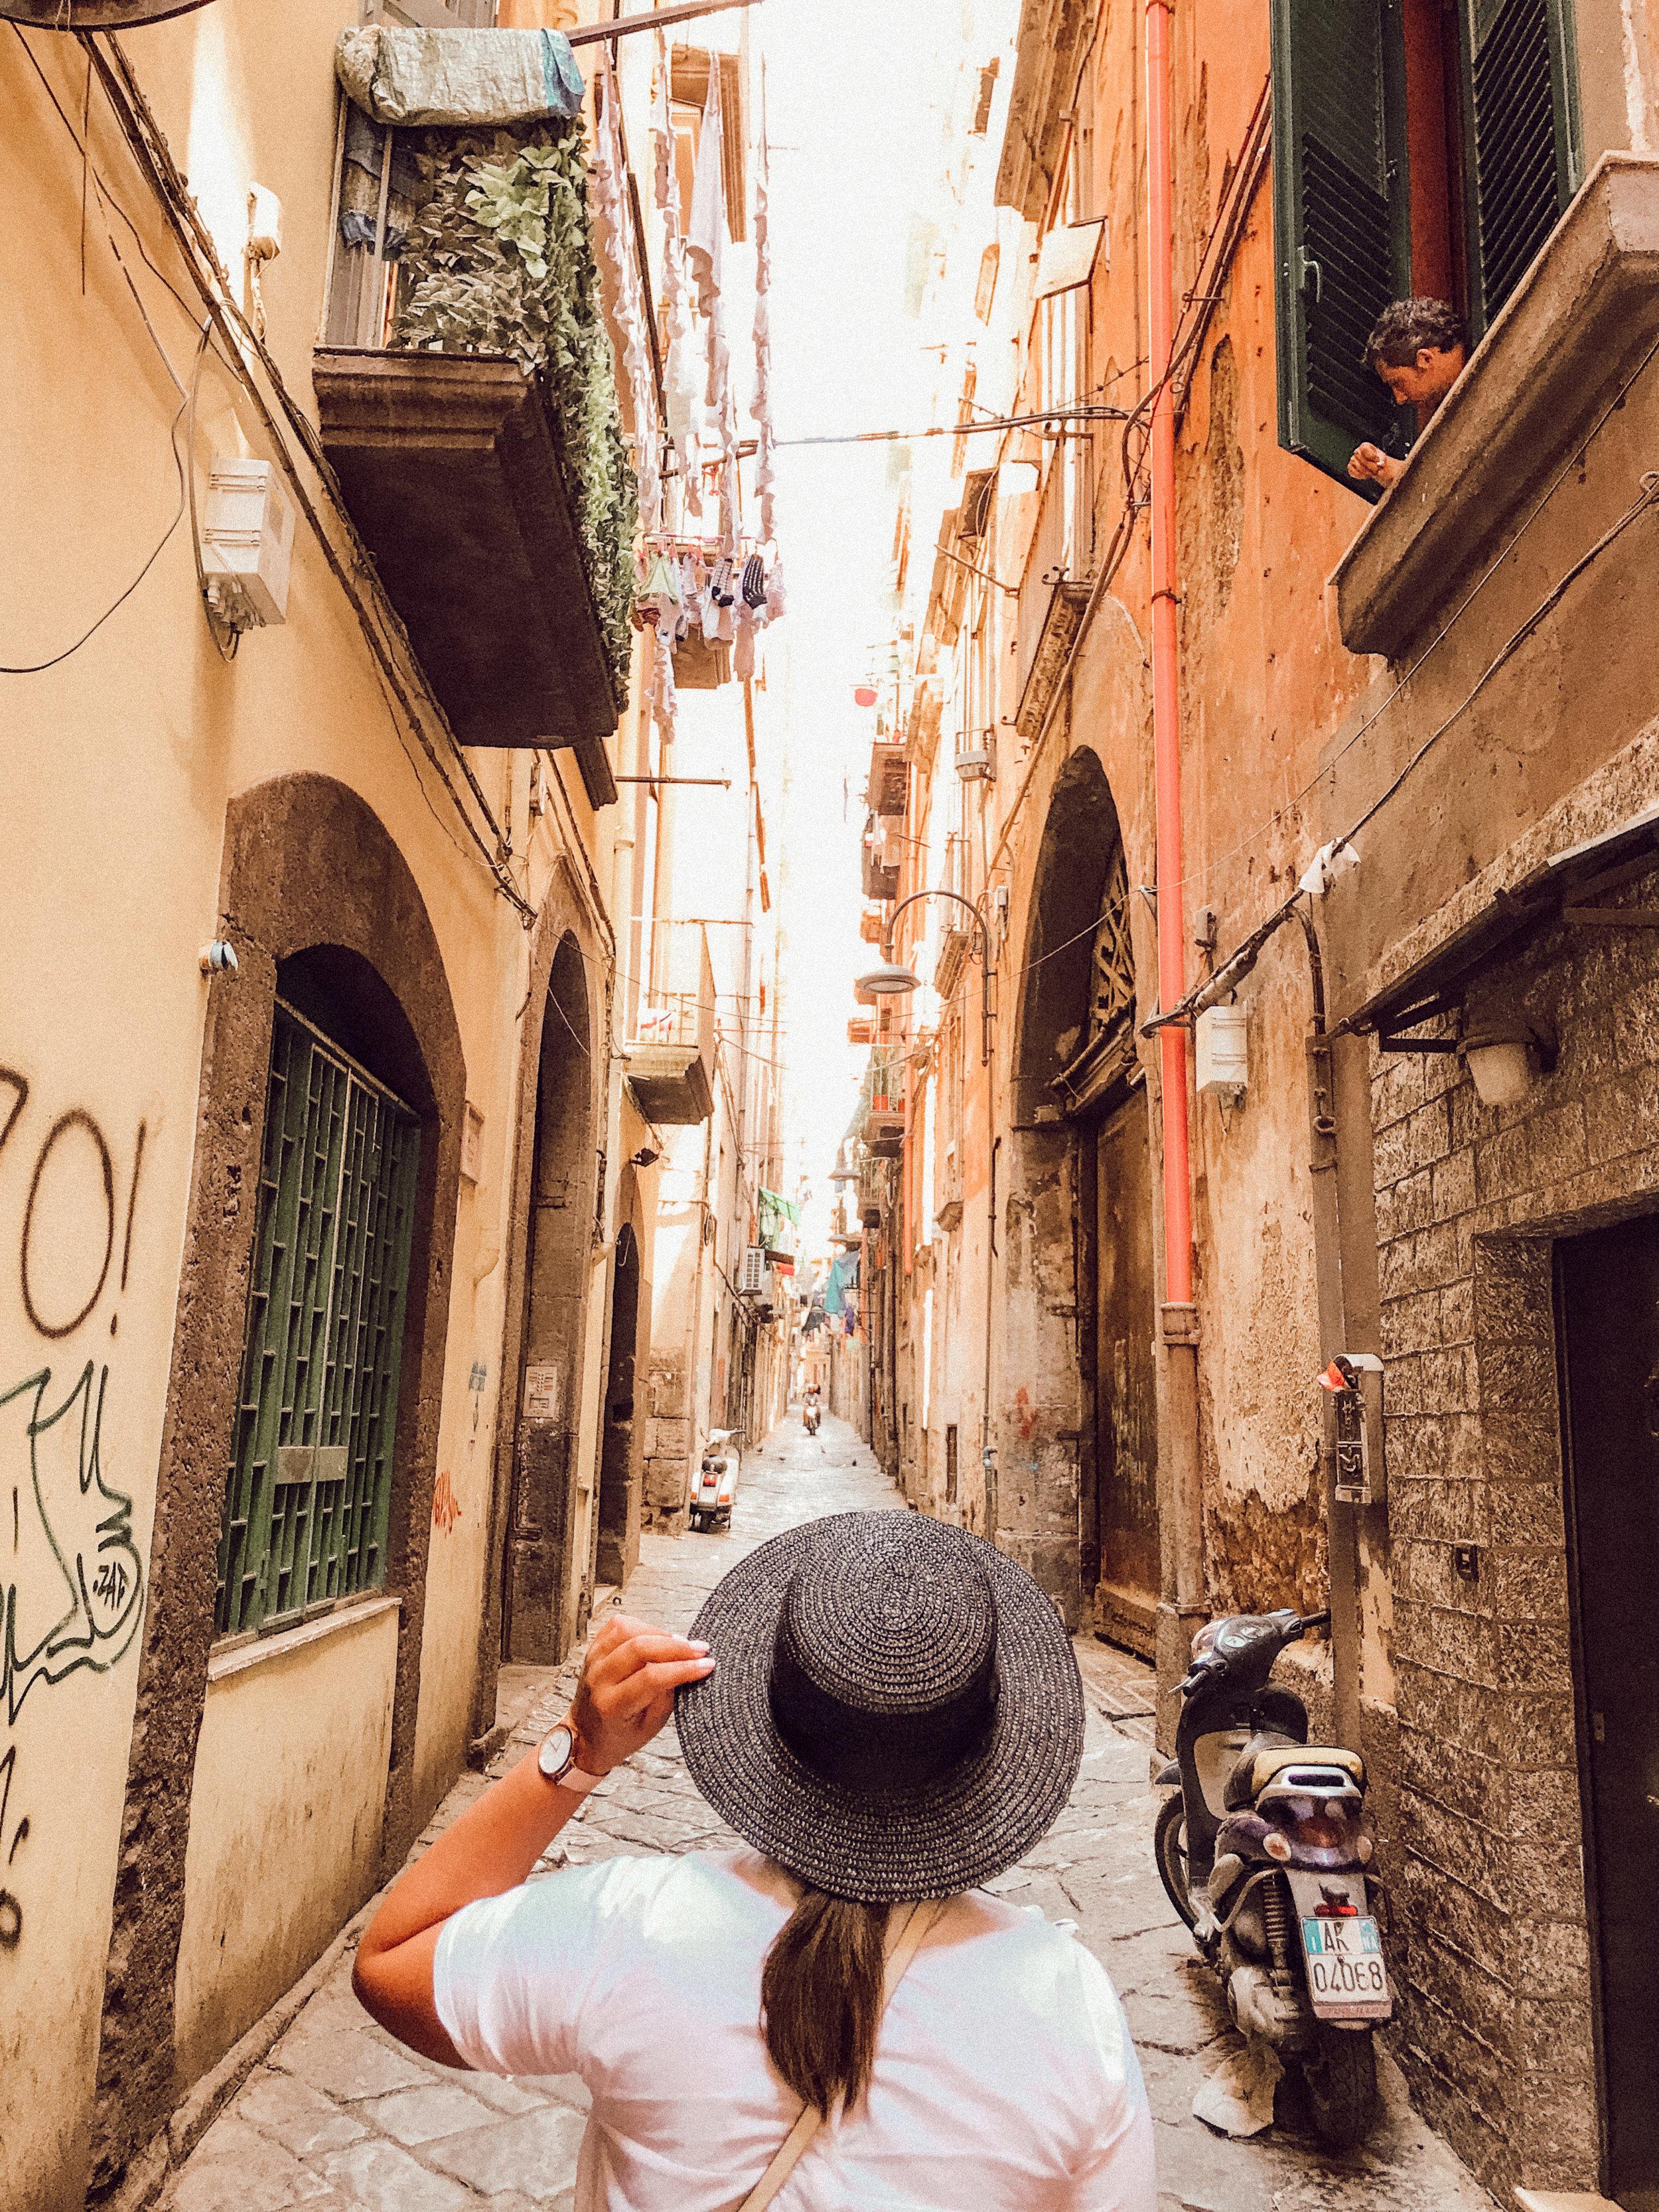 Alley in Napoli